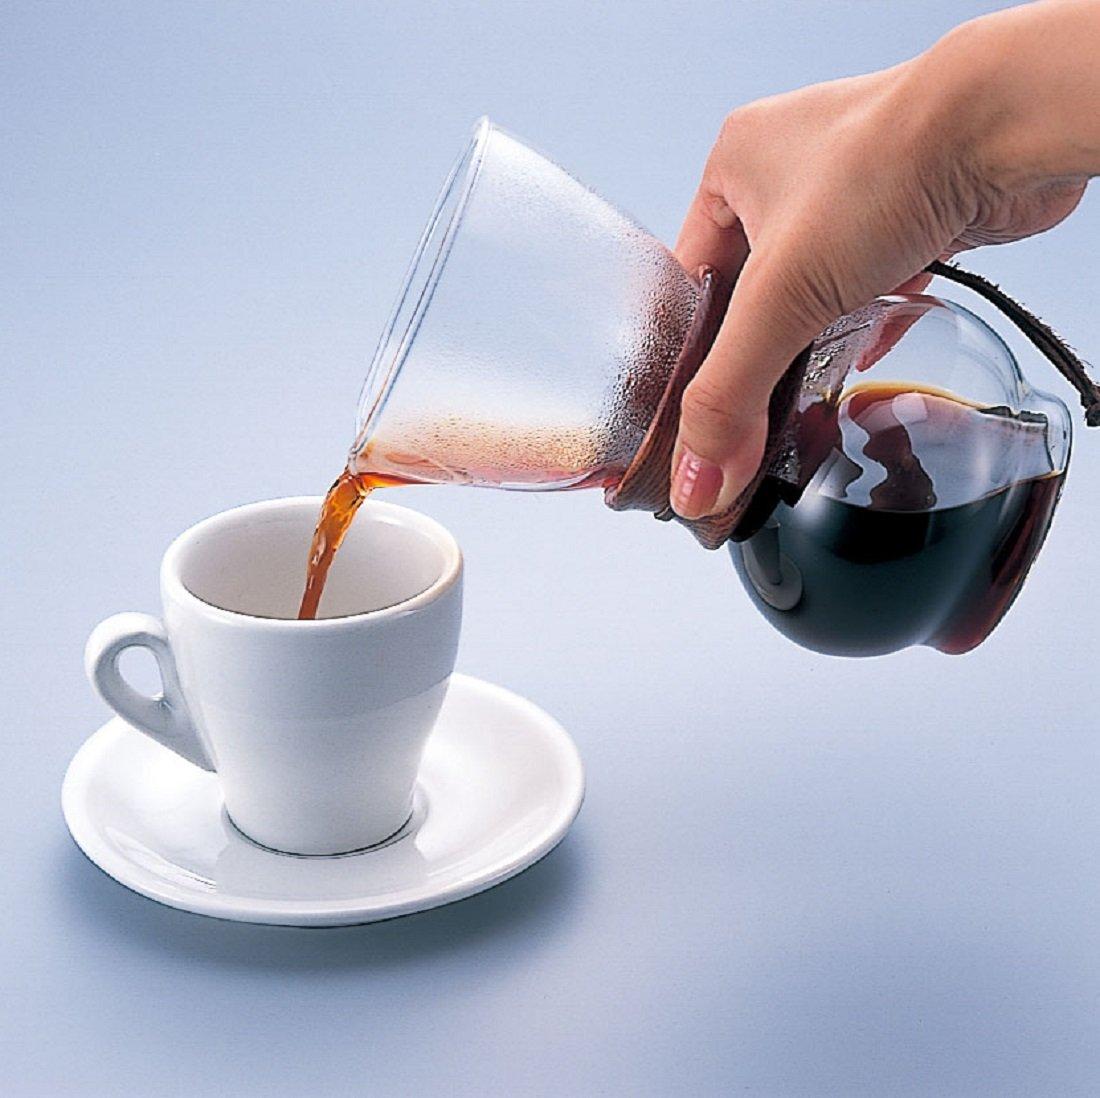 Hario woodneck coffee drip pot - Hario 1 Piece 240 Ml Glass Drip Pot Natural Amazon Co Uk Kitchen Home